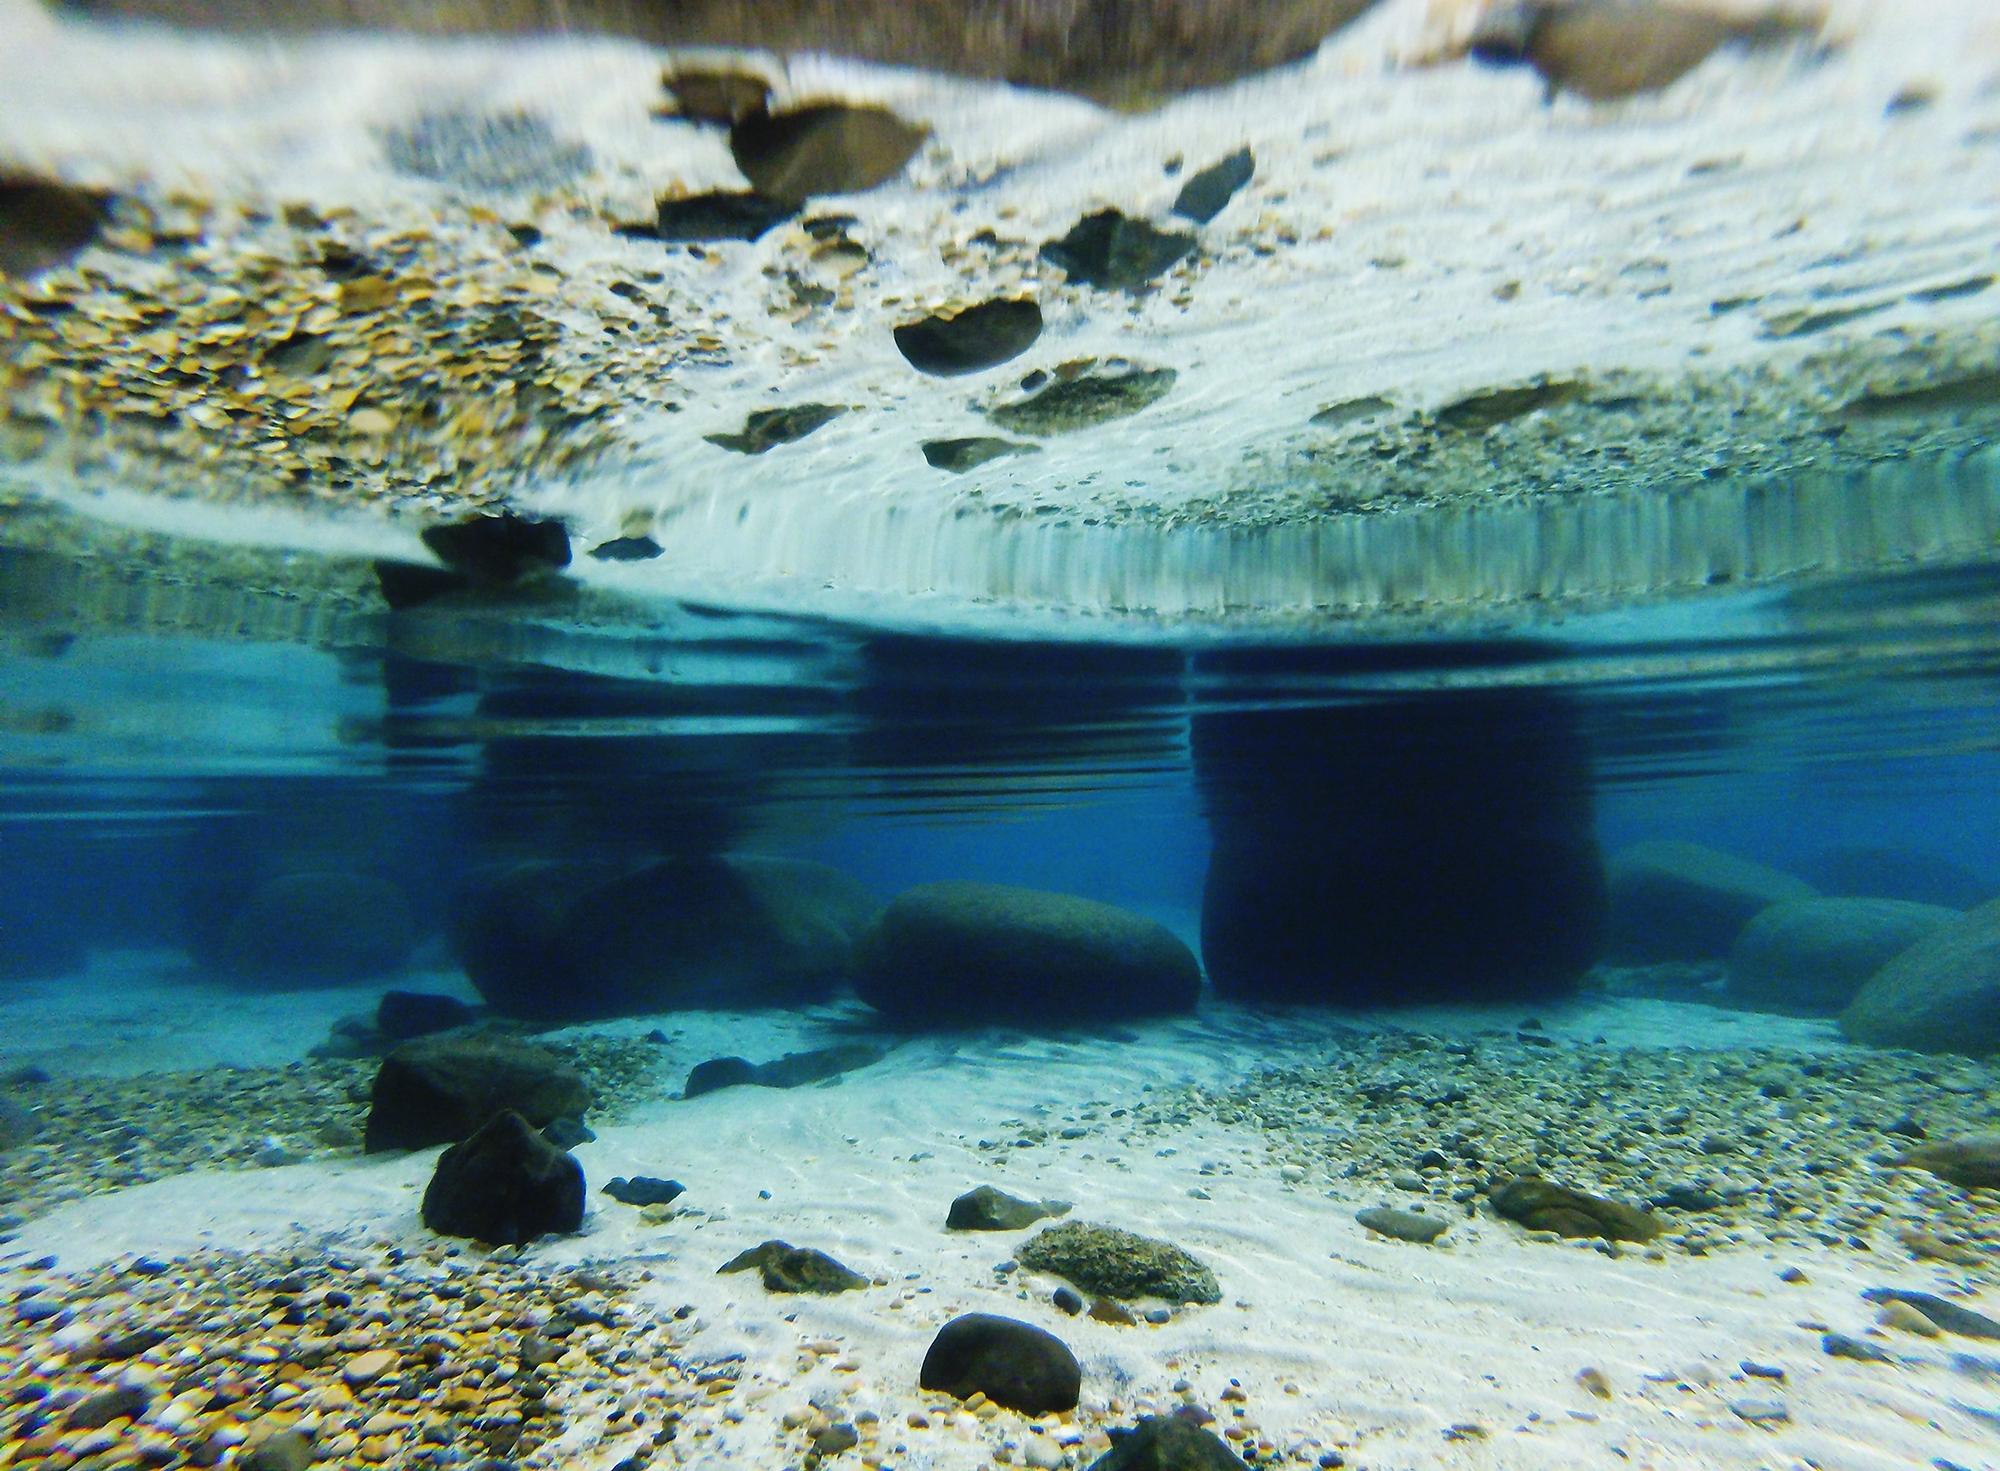 secret cove underwater gopro session